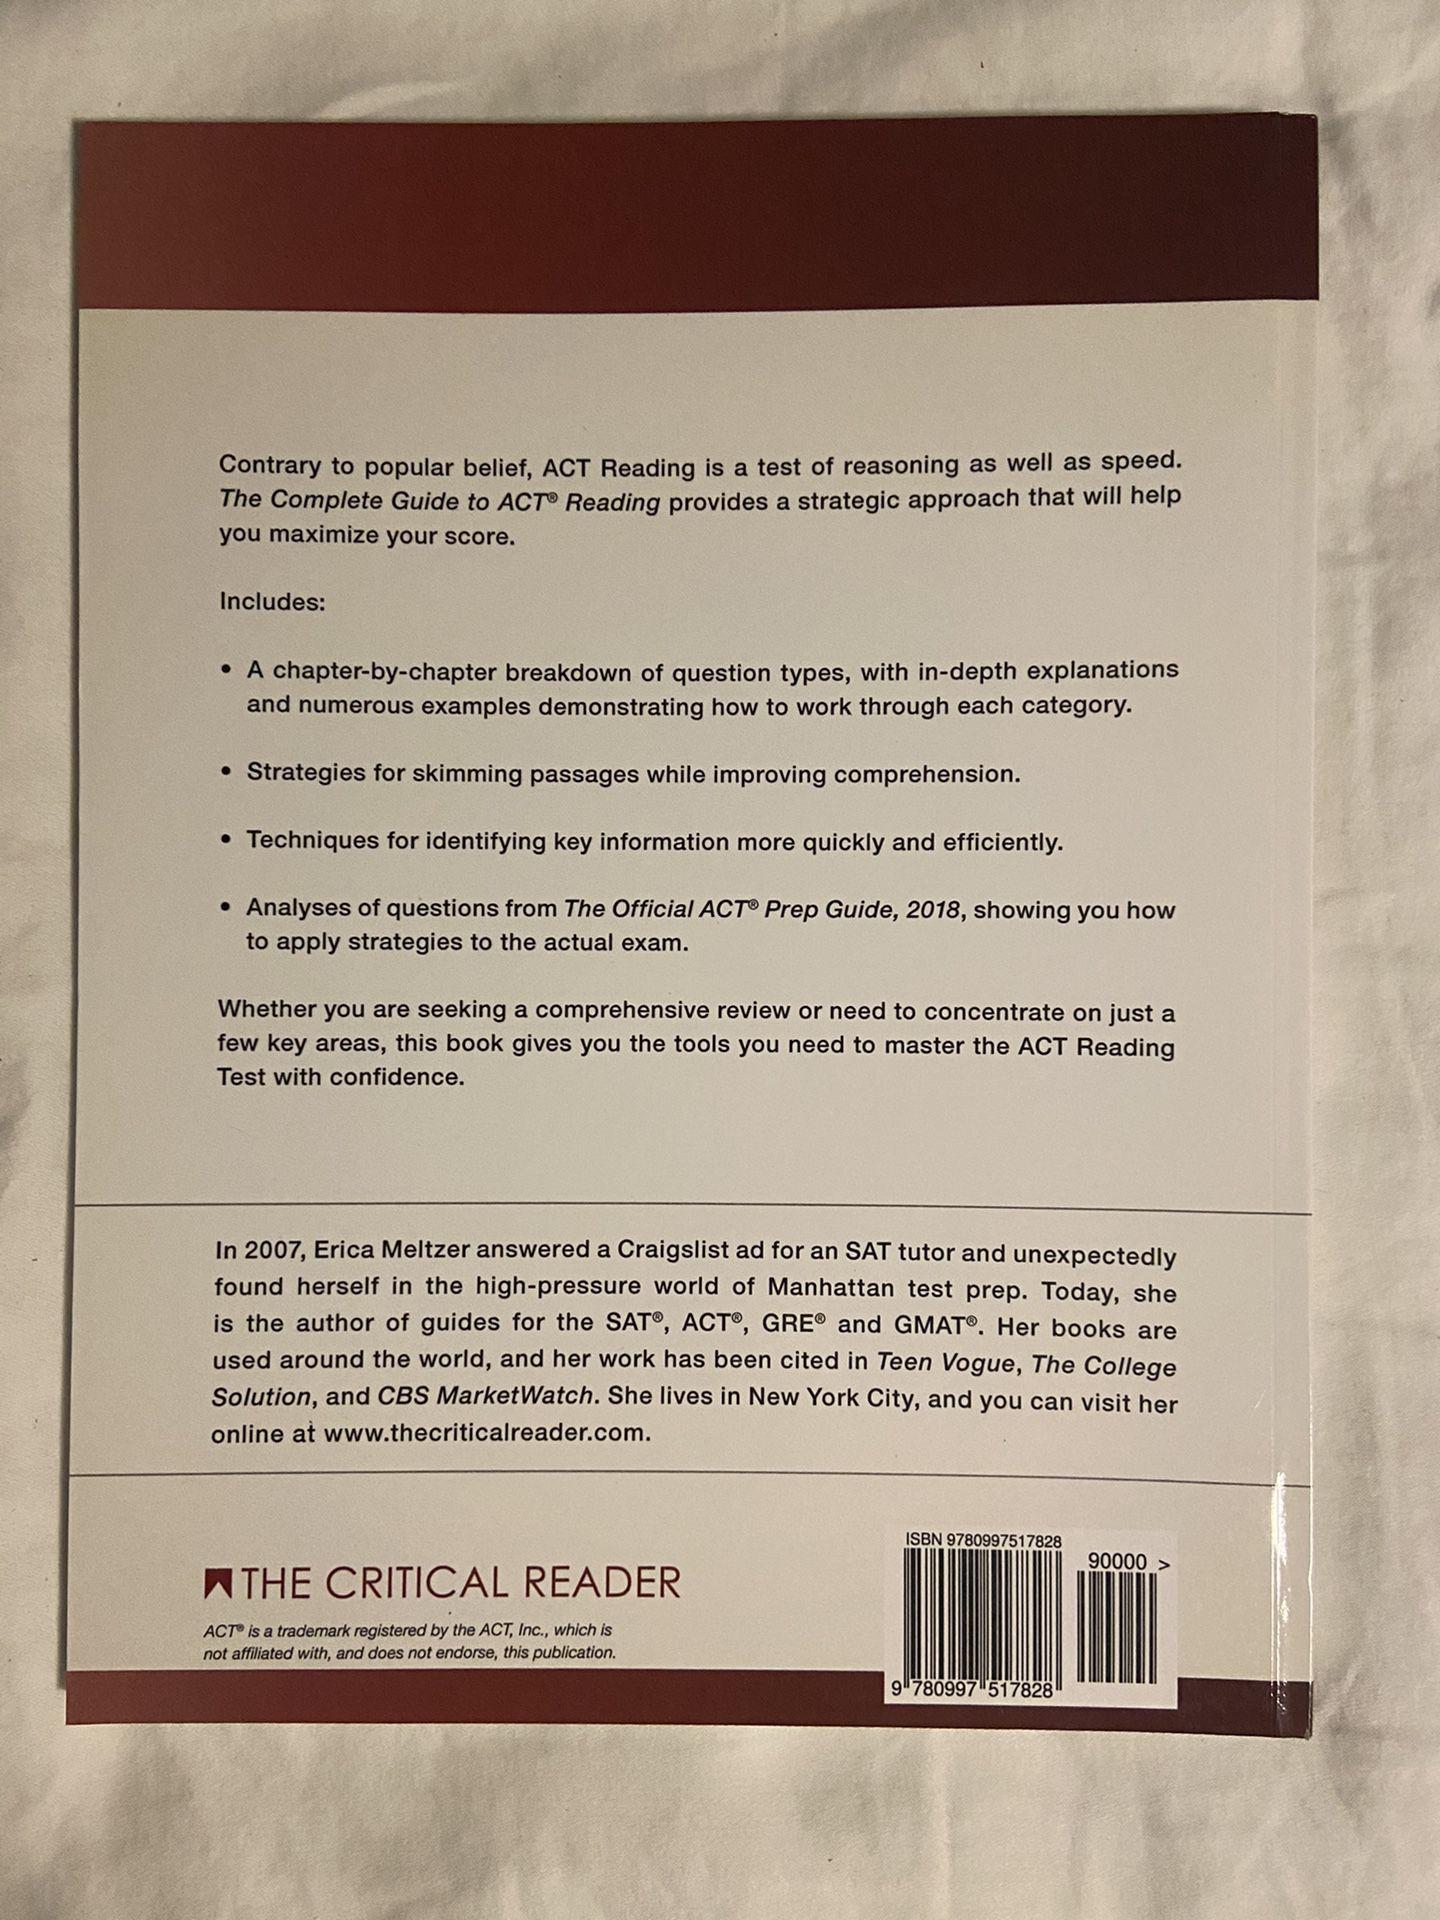 ACT Reading Book, Erica L. Metlzer